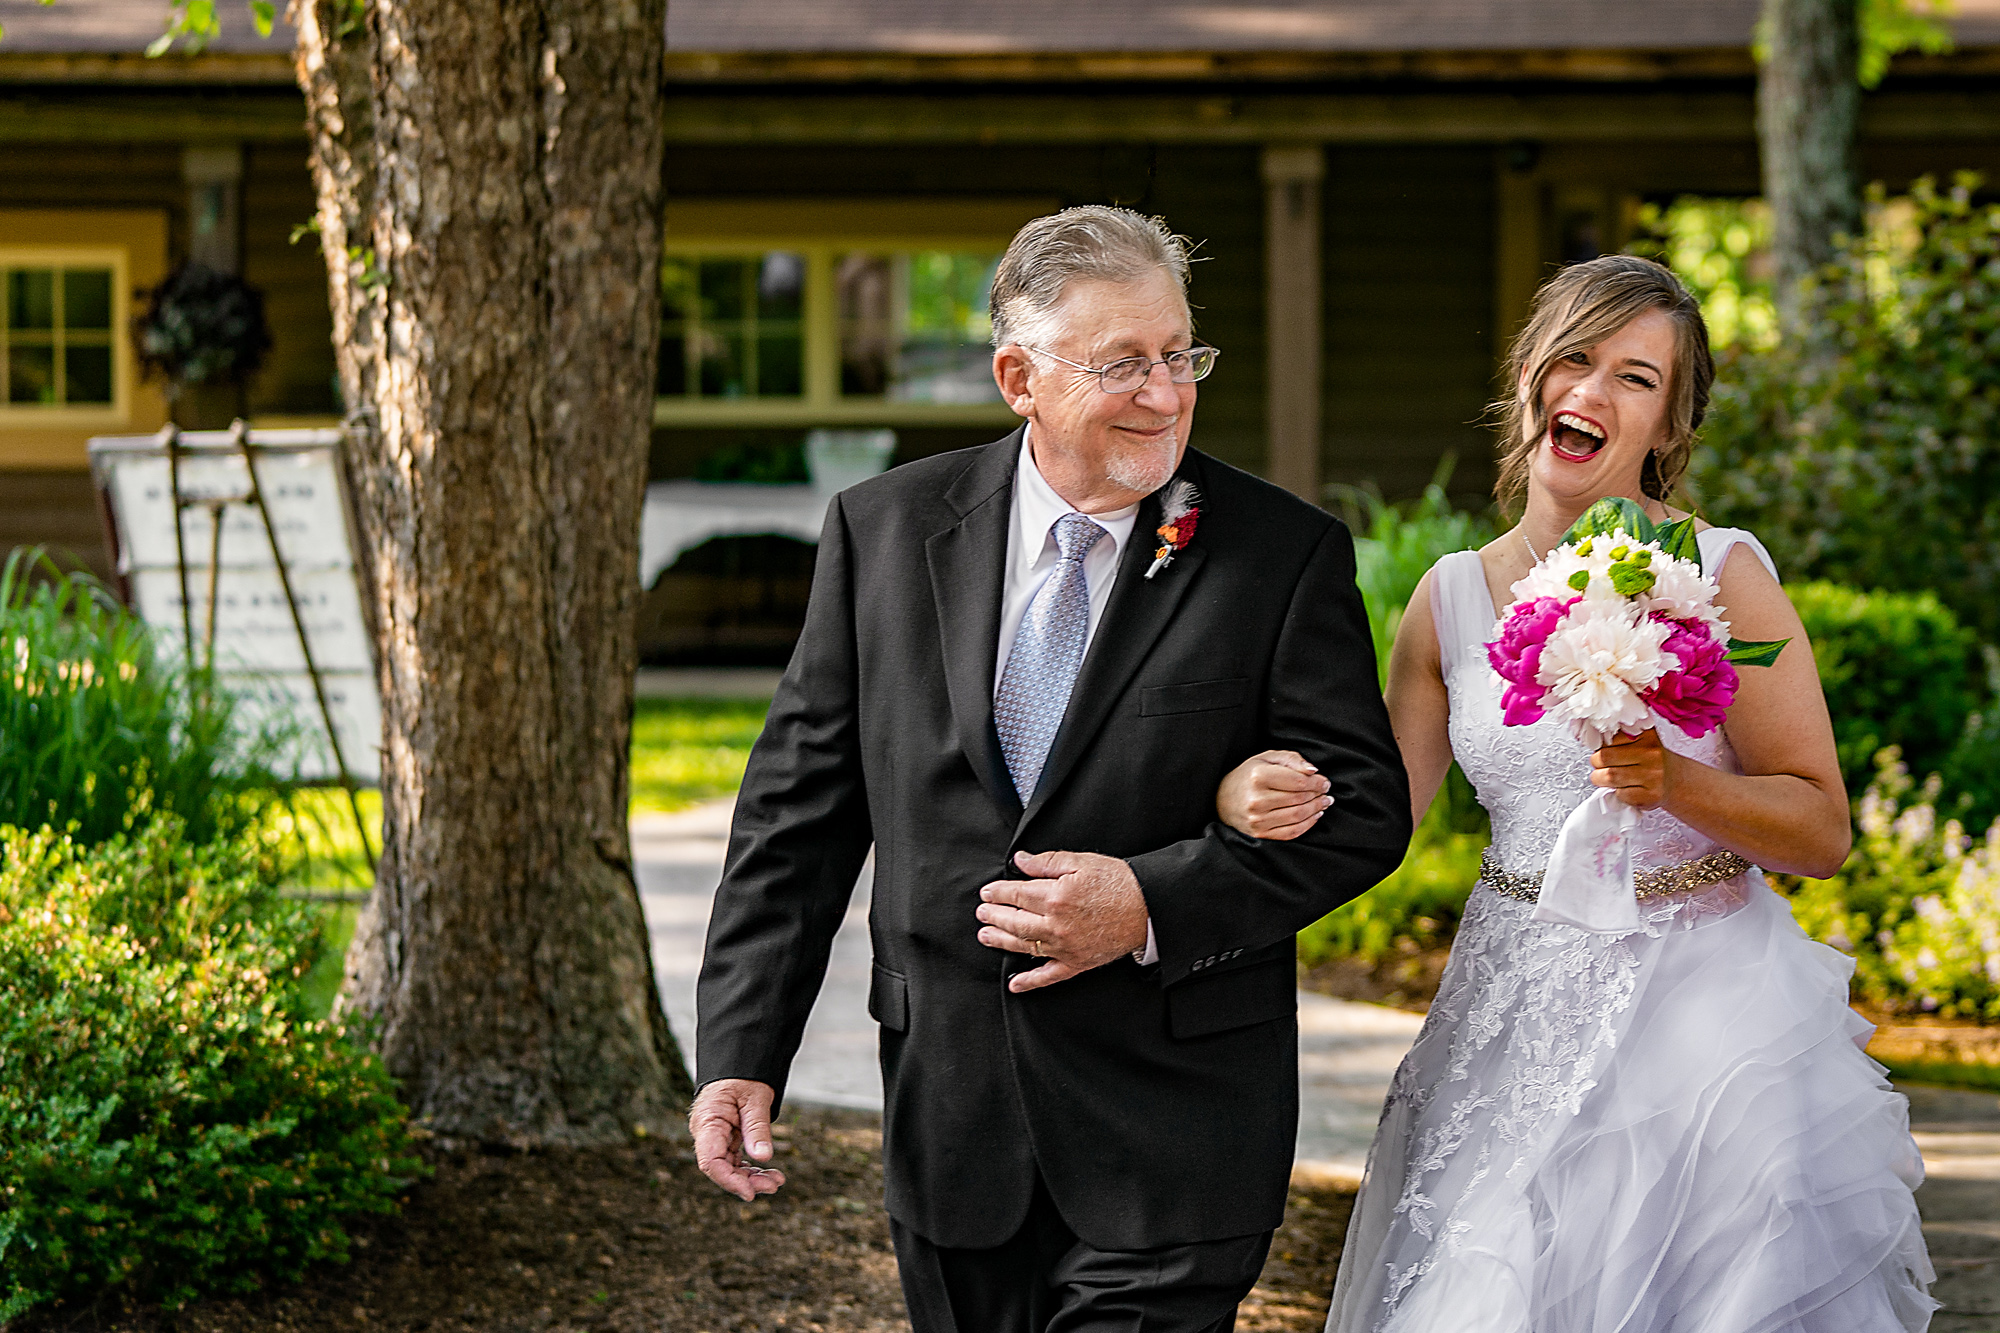 Pattison-Park-Lodge-Wedding-Cincinnati-Ohio-Photographer-3.jpg